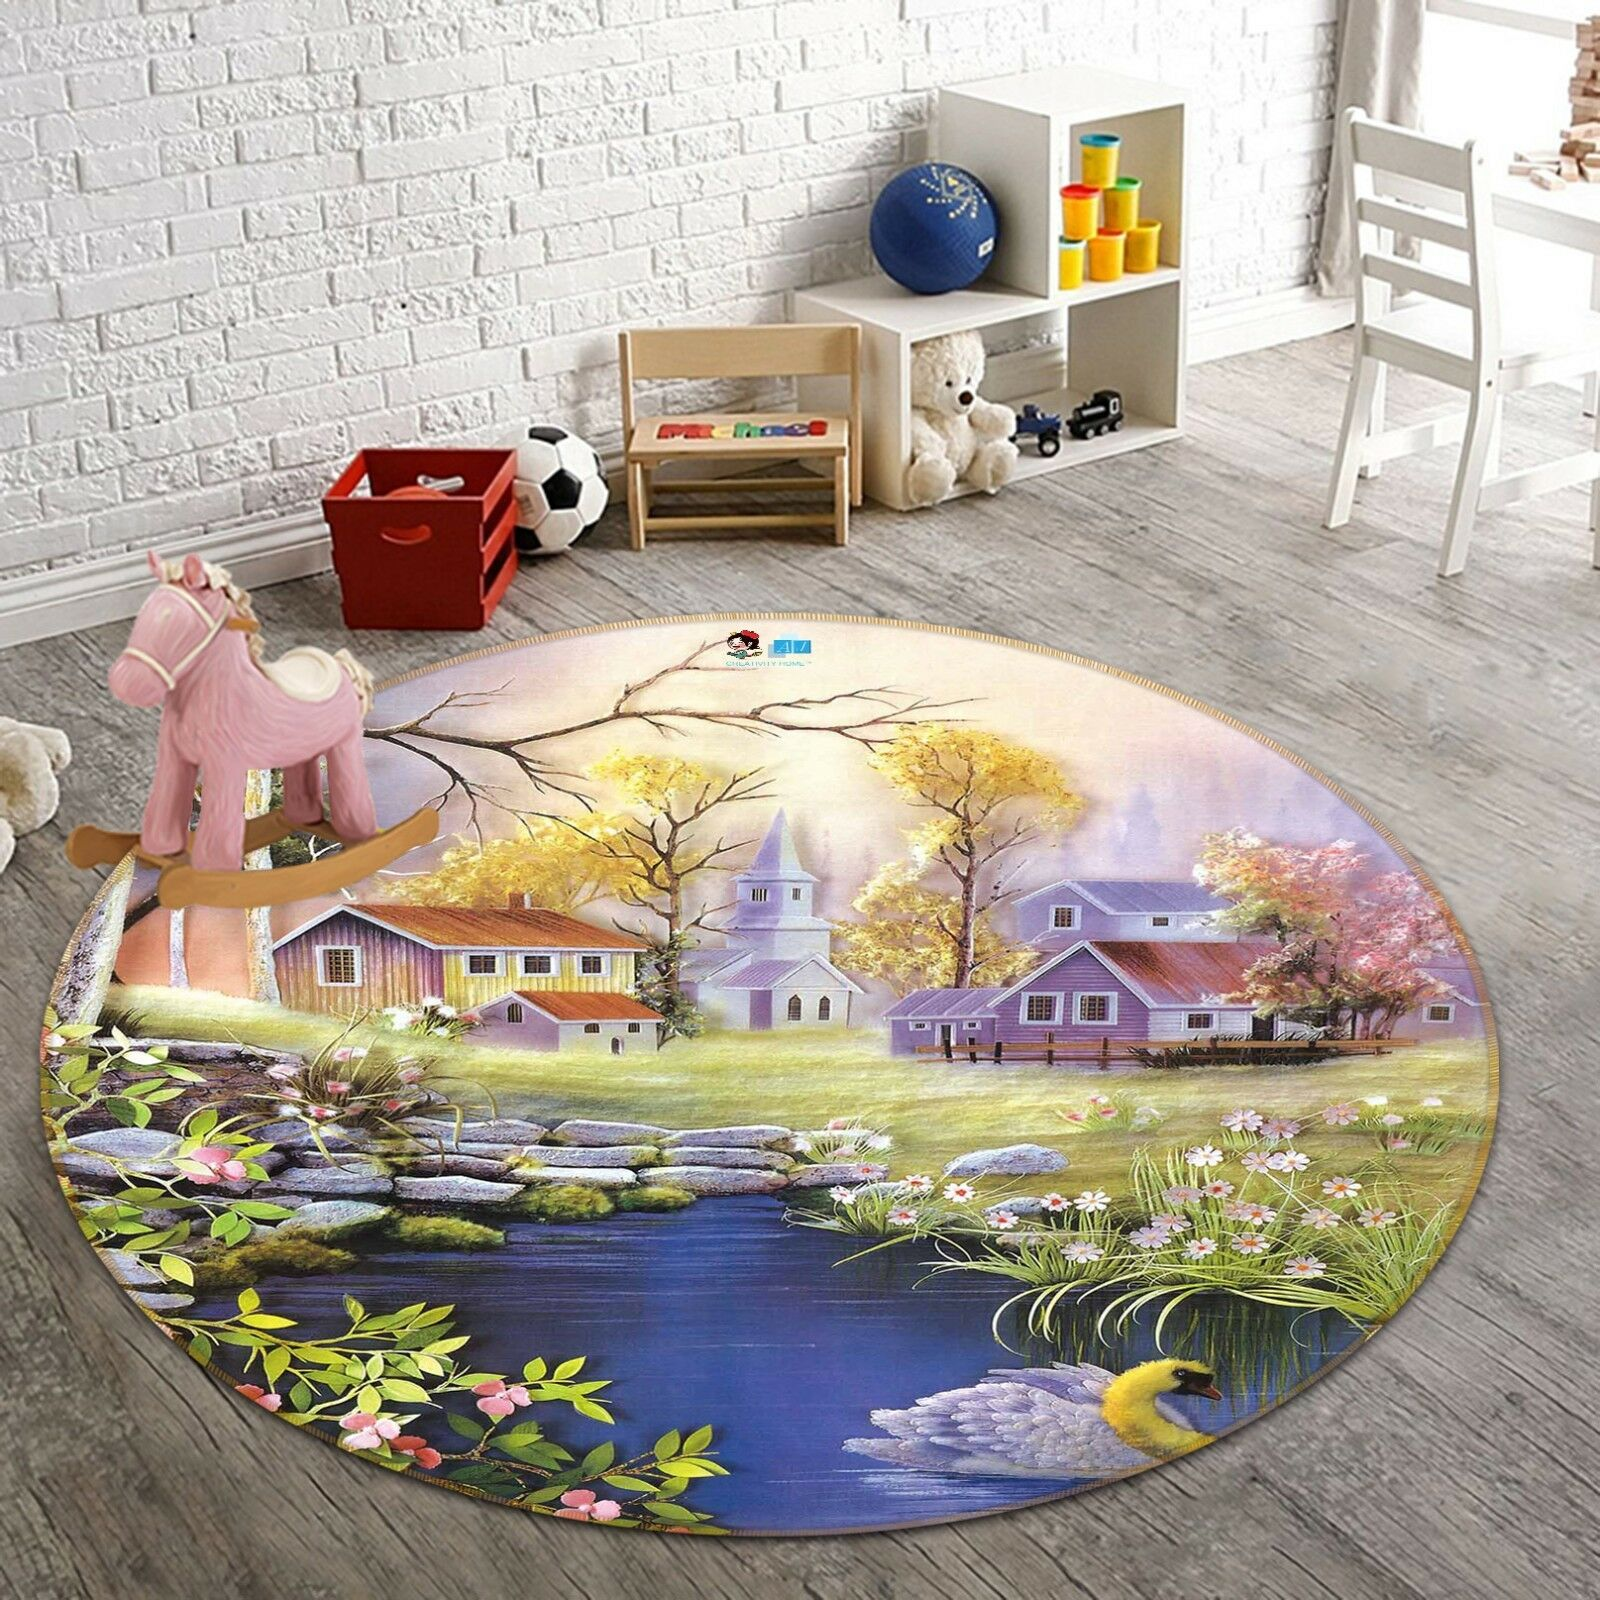 3D Garden View 8 8 8 Non Slip Rug Mat Room Mat Round Quality Elegant Photo Carpet US 9472c0